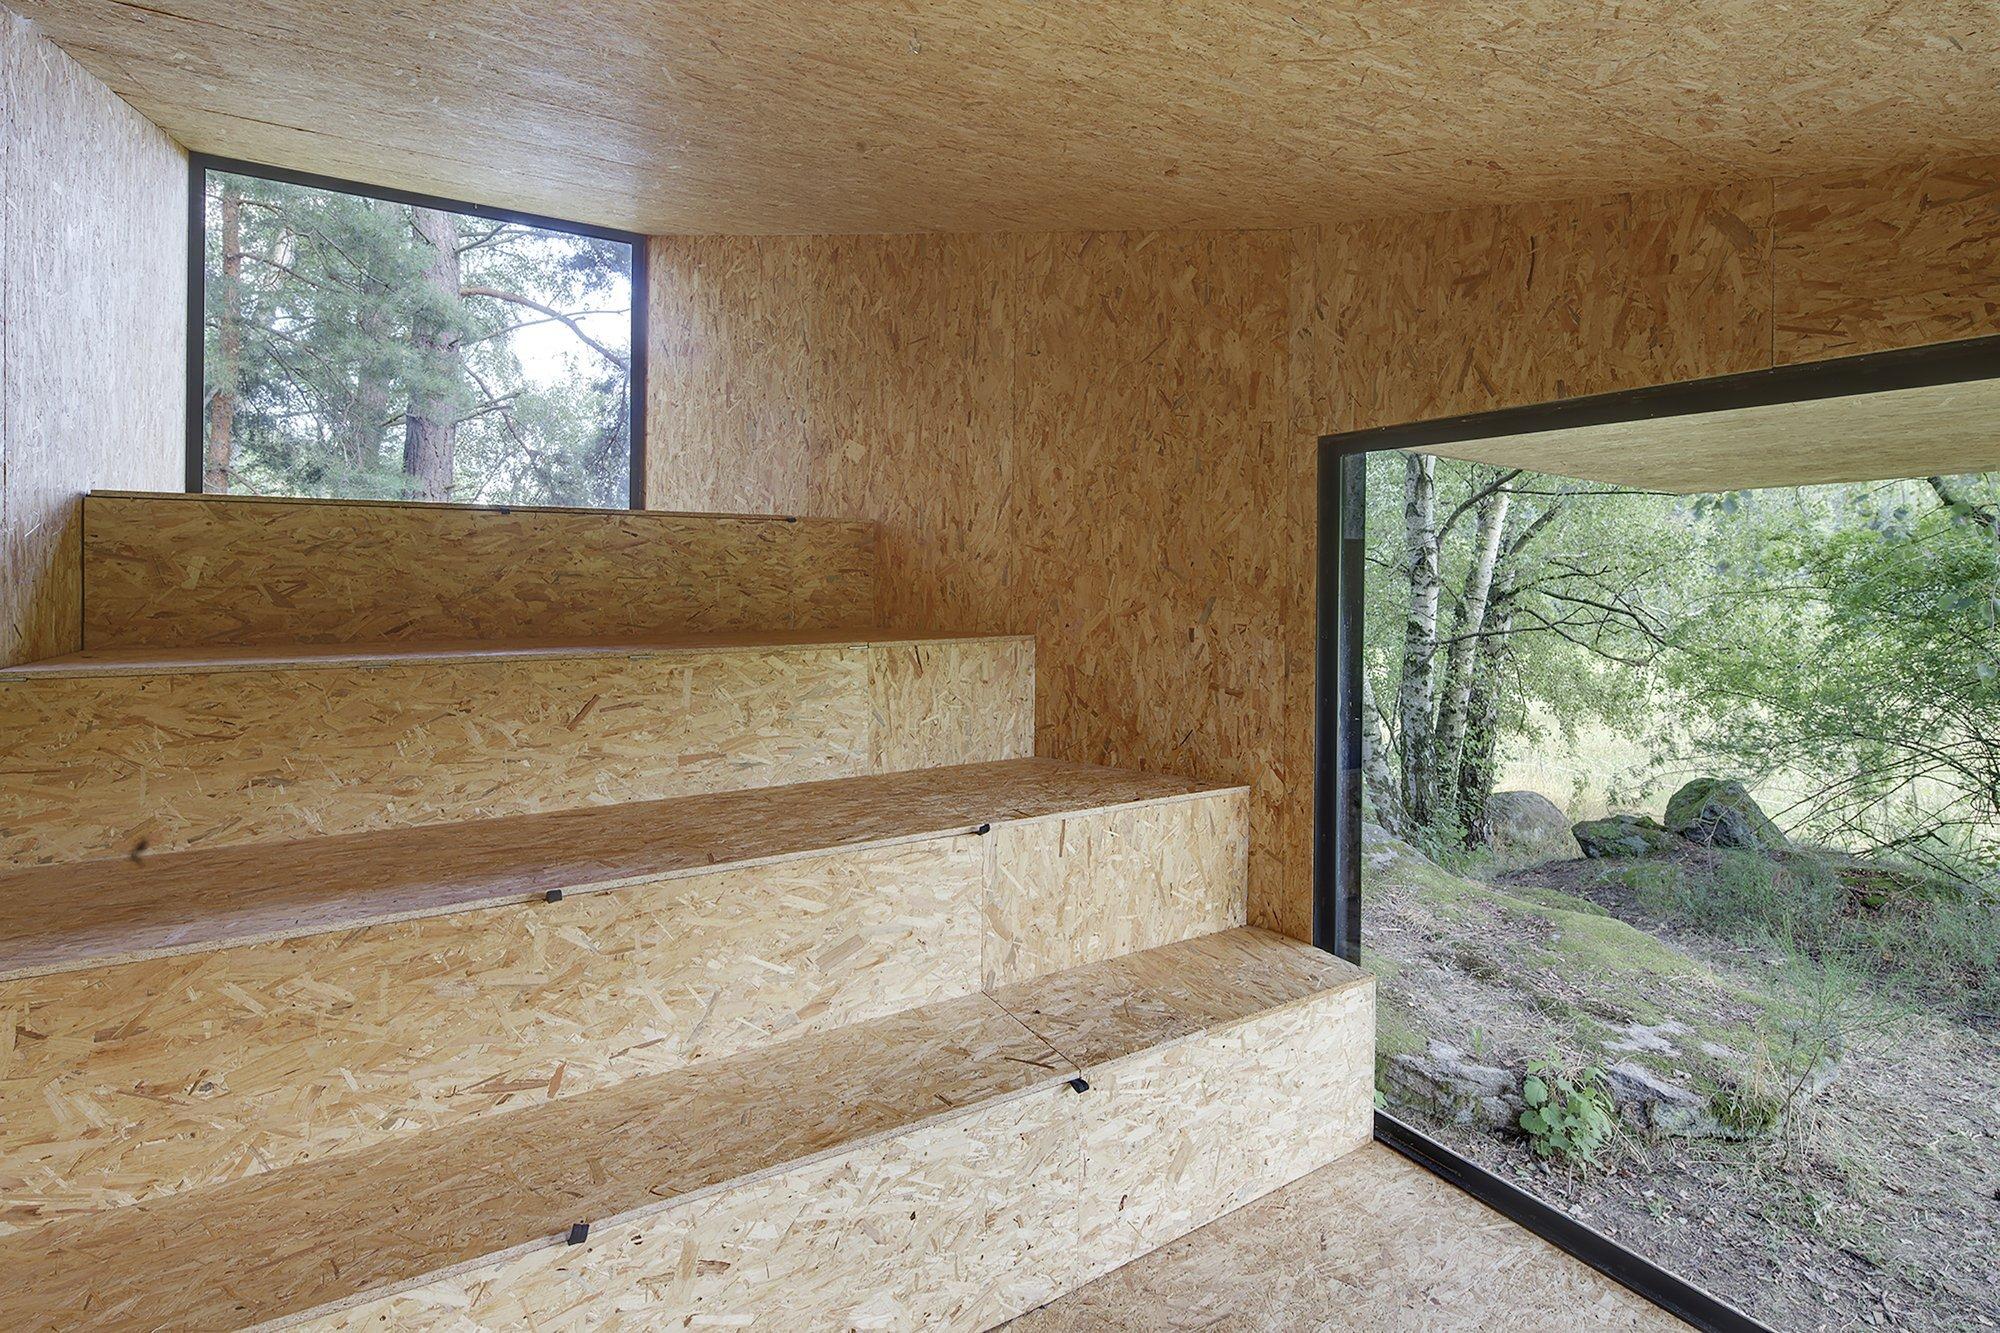 Forest Retreat - Uhlik architekti - Czech Republic - Interior - Humble Homes